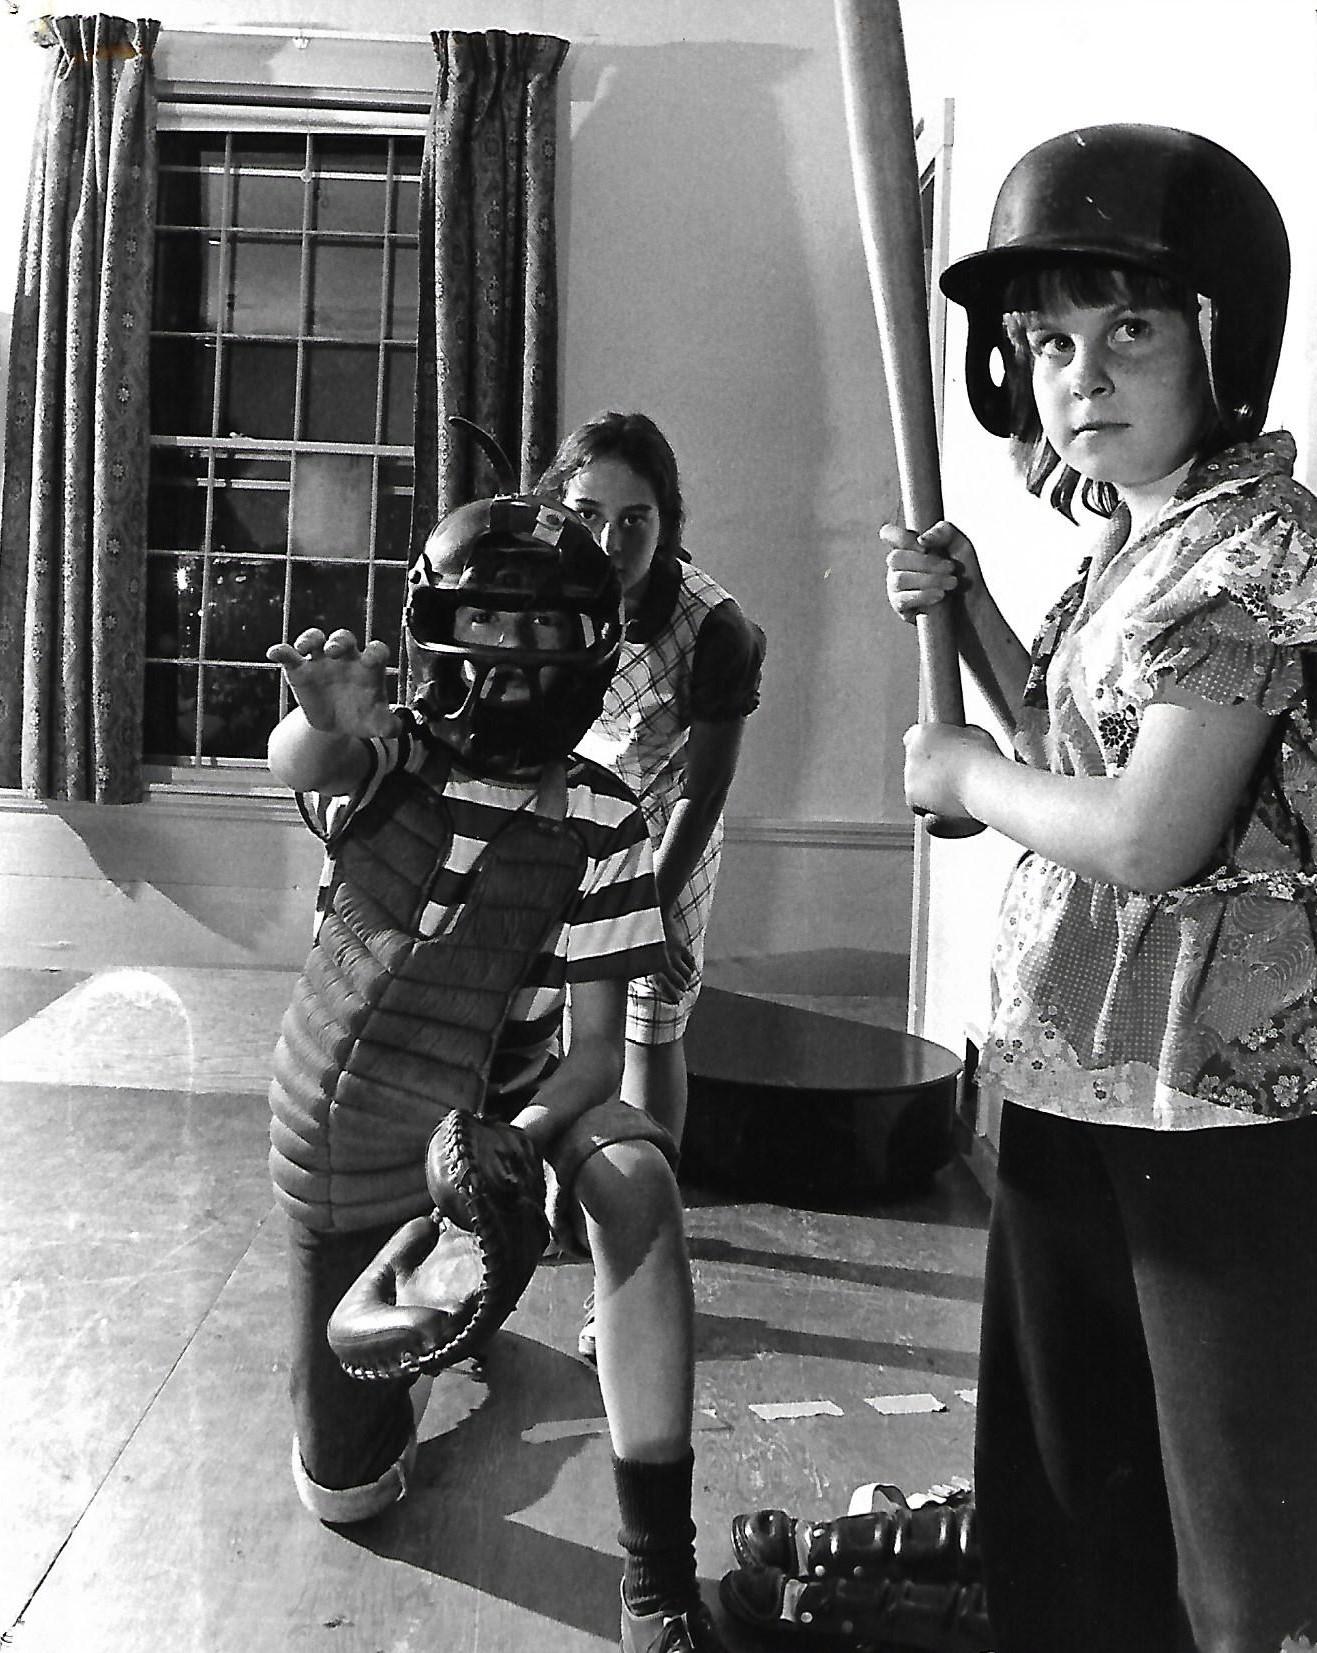 (Left to Right) Ken McClelland (Schroeder), Kara Leel (Violet), Deanna Smith (Peppermint Patty)